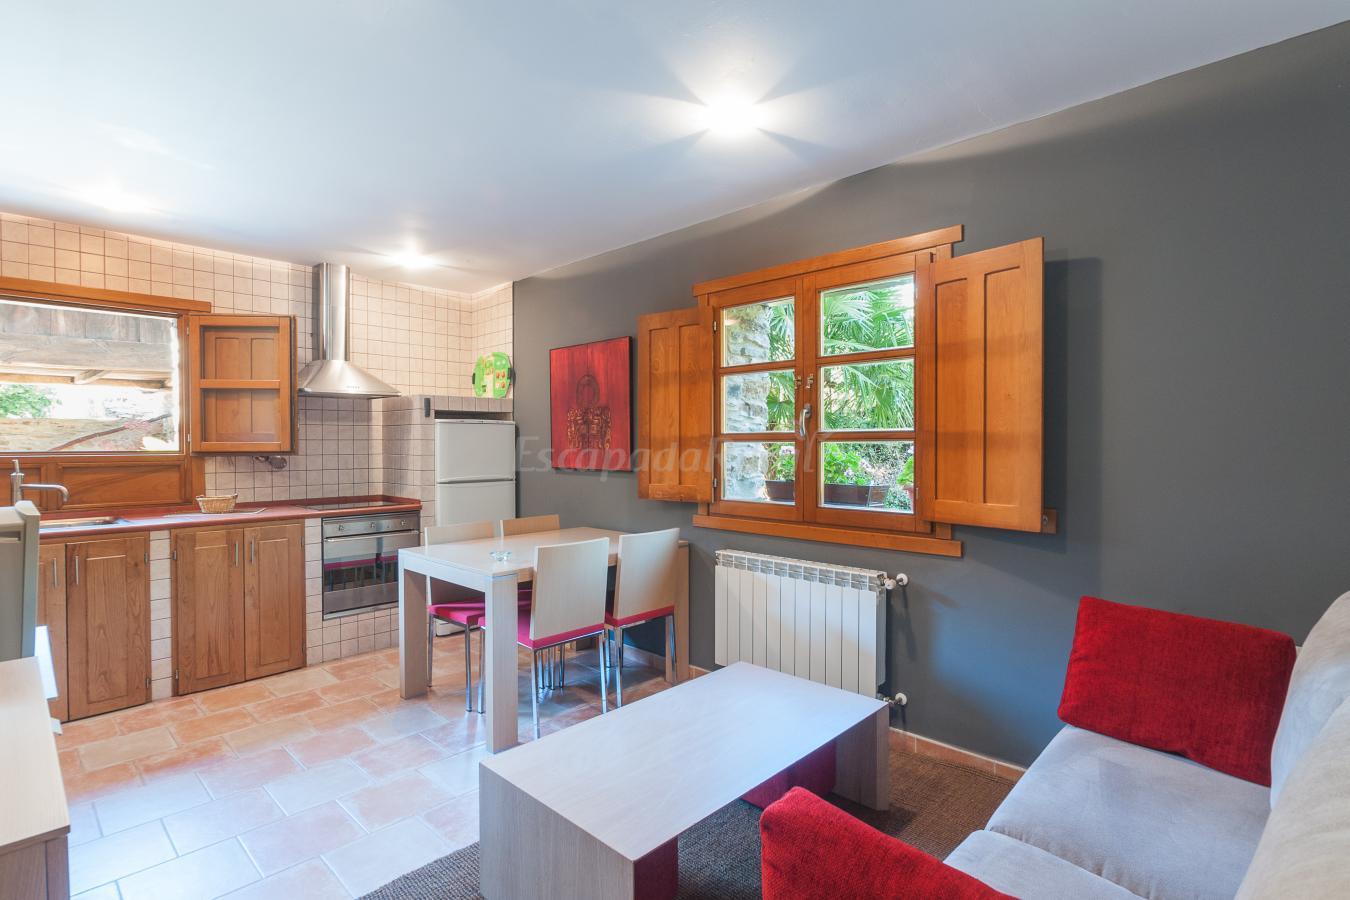 Foto di apartamentos palacio rosa mar casa vacanze acangas del narcea asturias - Apartamentos baratos asturias ...